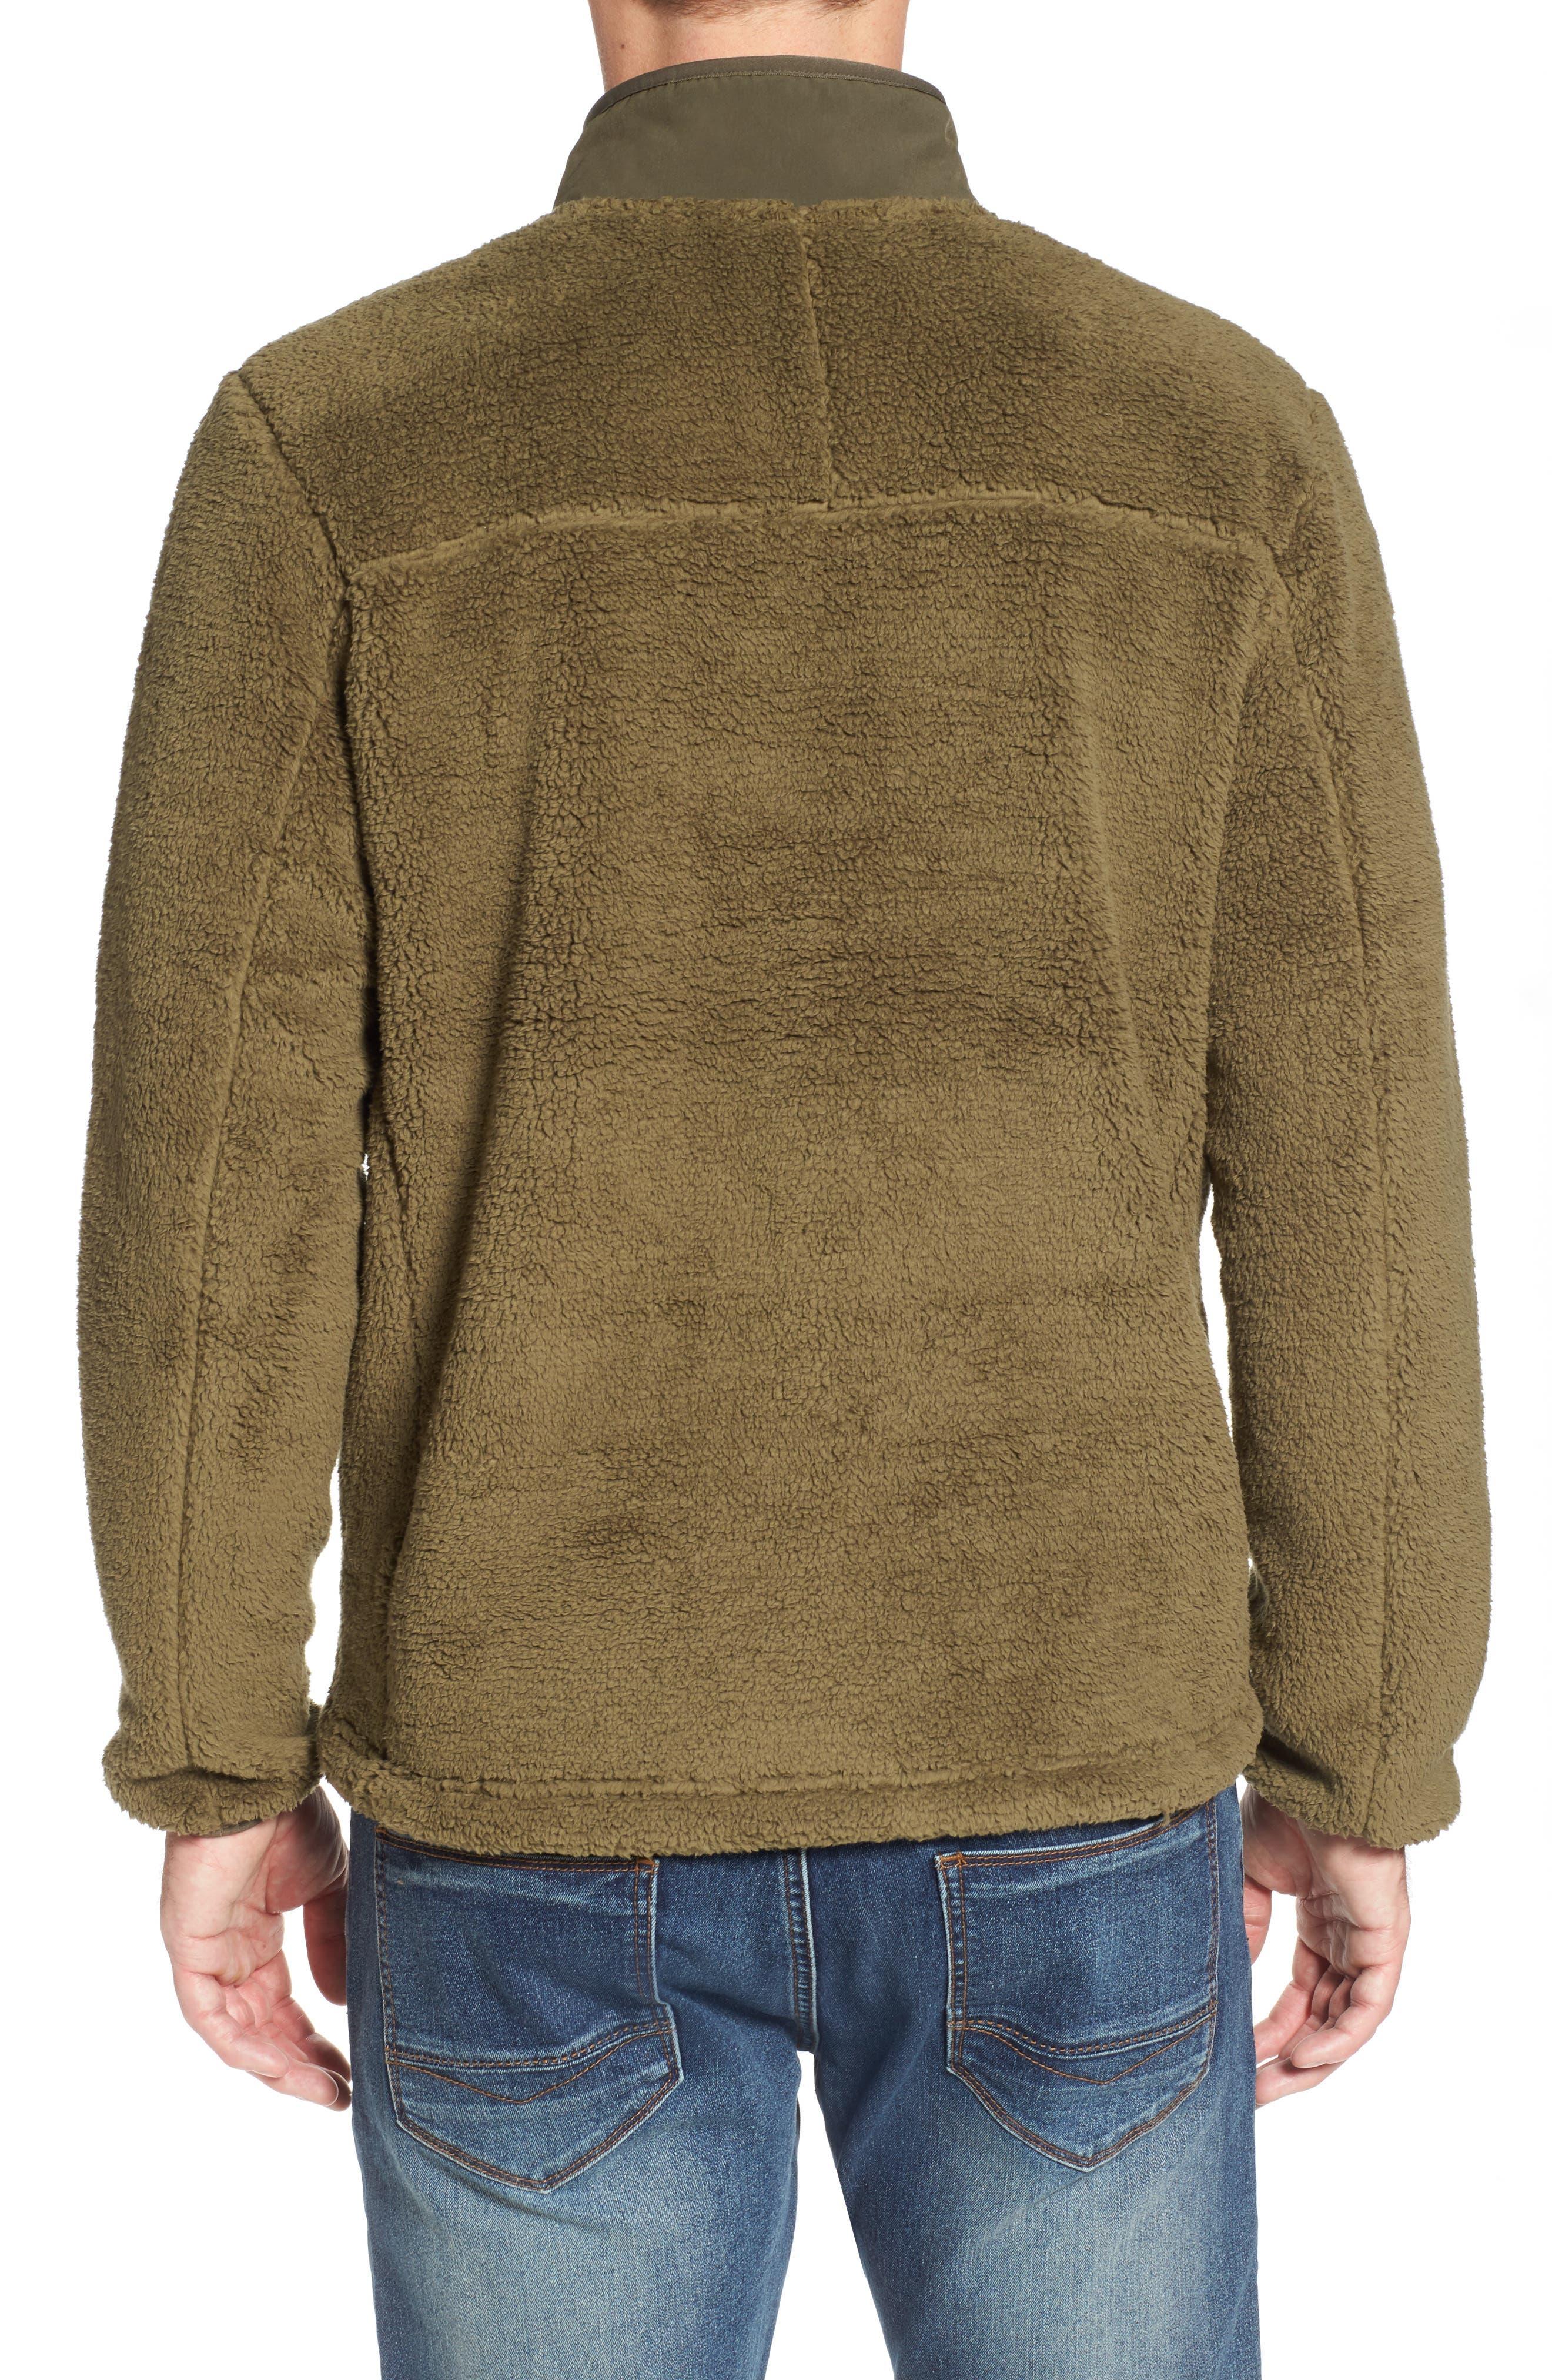 Khampfire Fleece Pullover,                             Alternate thumbnail 2, color,                             301